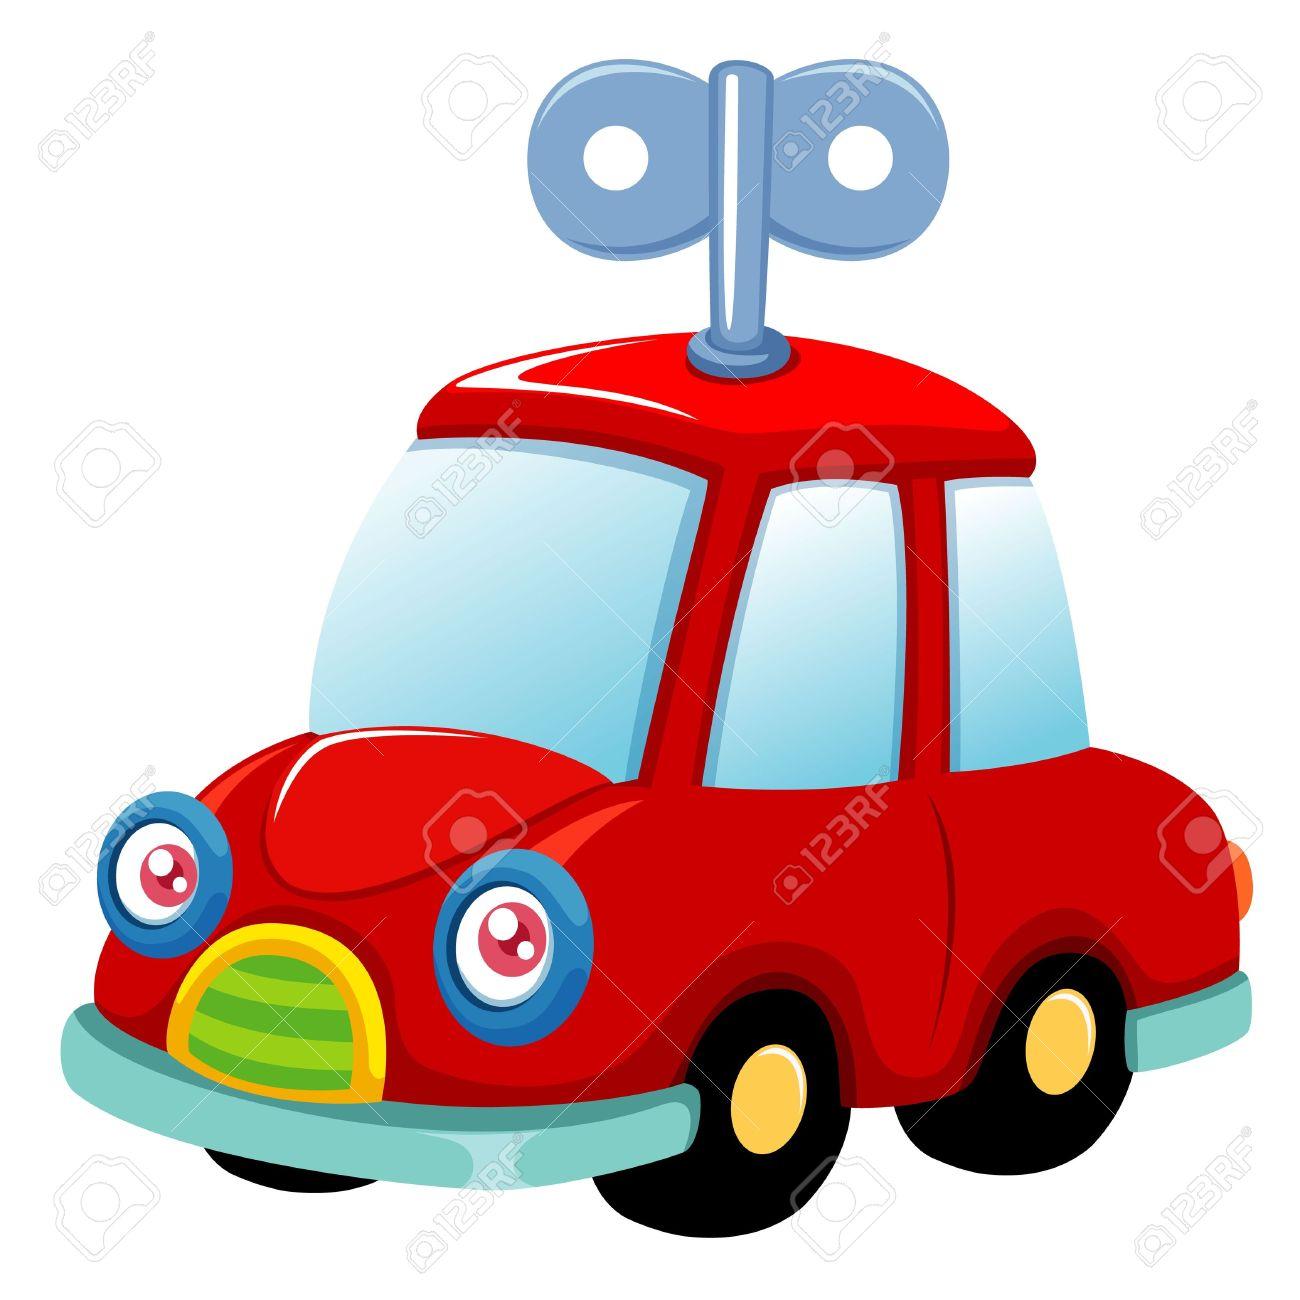 Car Clipart at GetDrawings